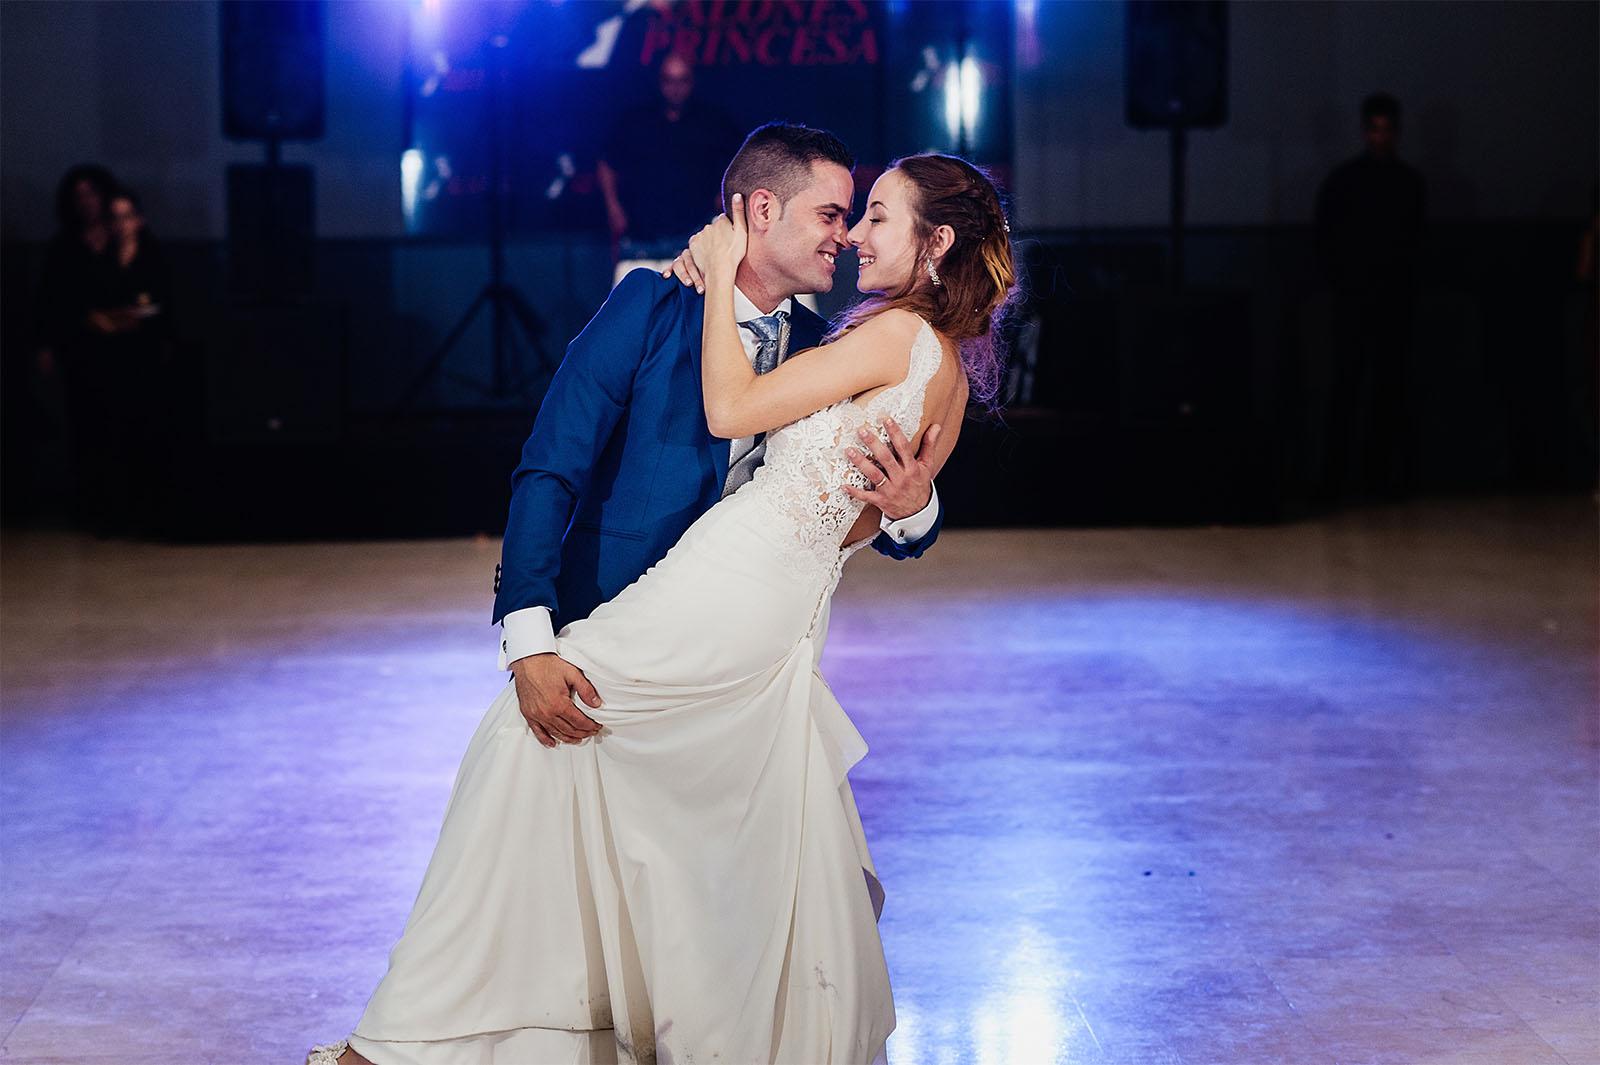 reportaje de fotos de boda